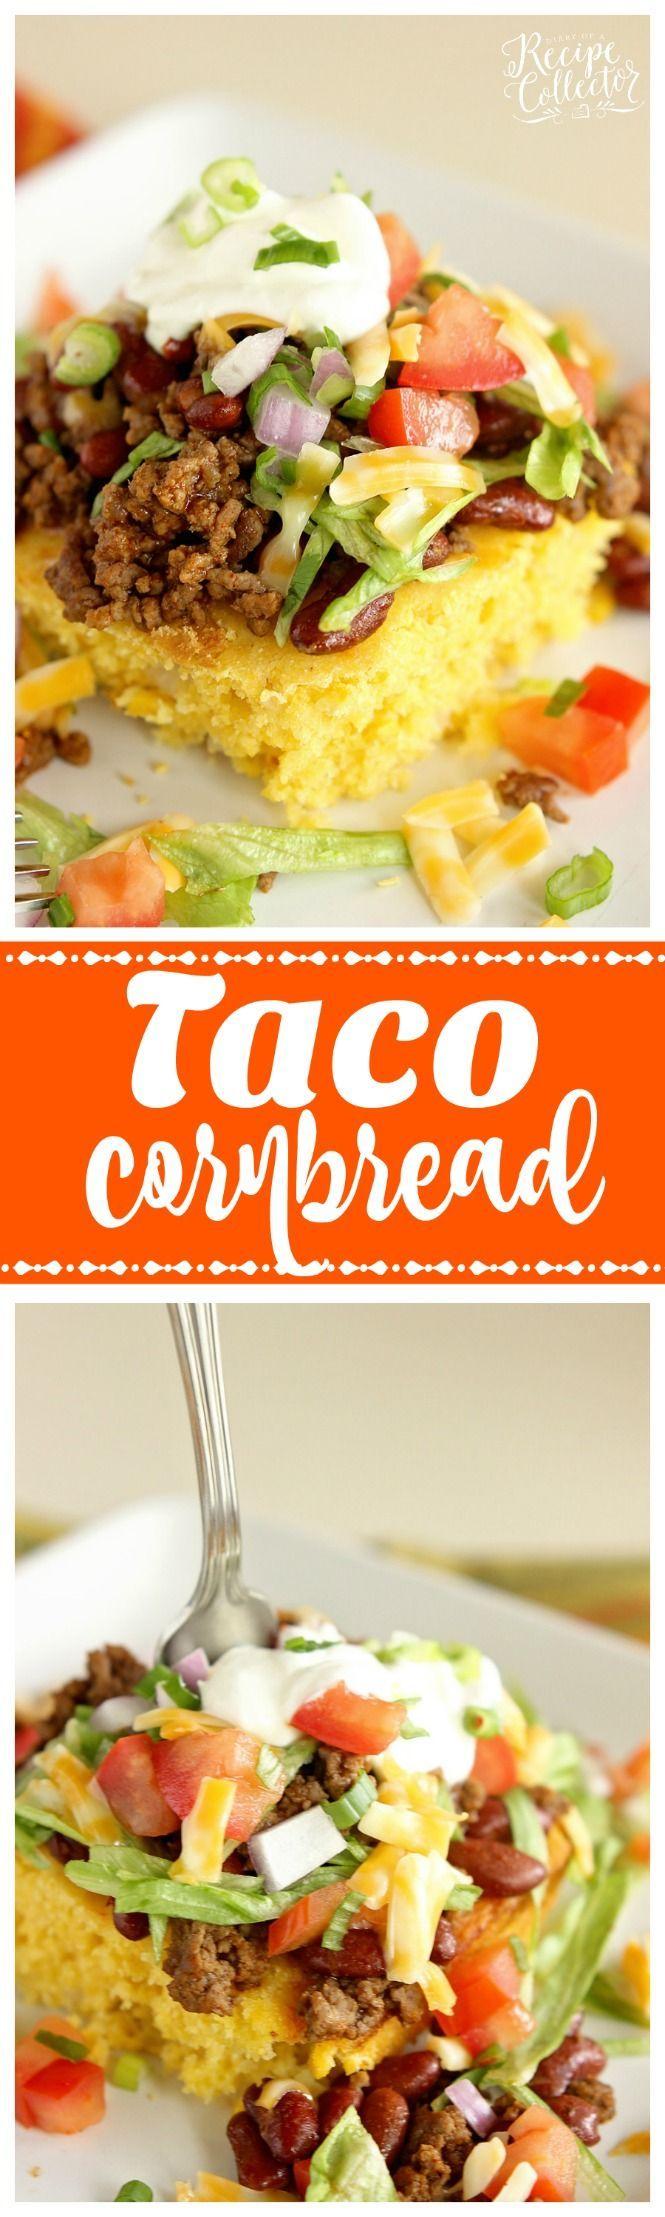 Taco Cornbread - Change up your taco night using cornbread for a delicious new twist!